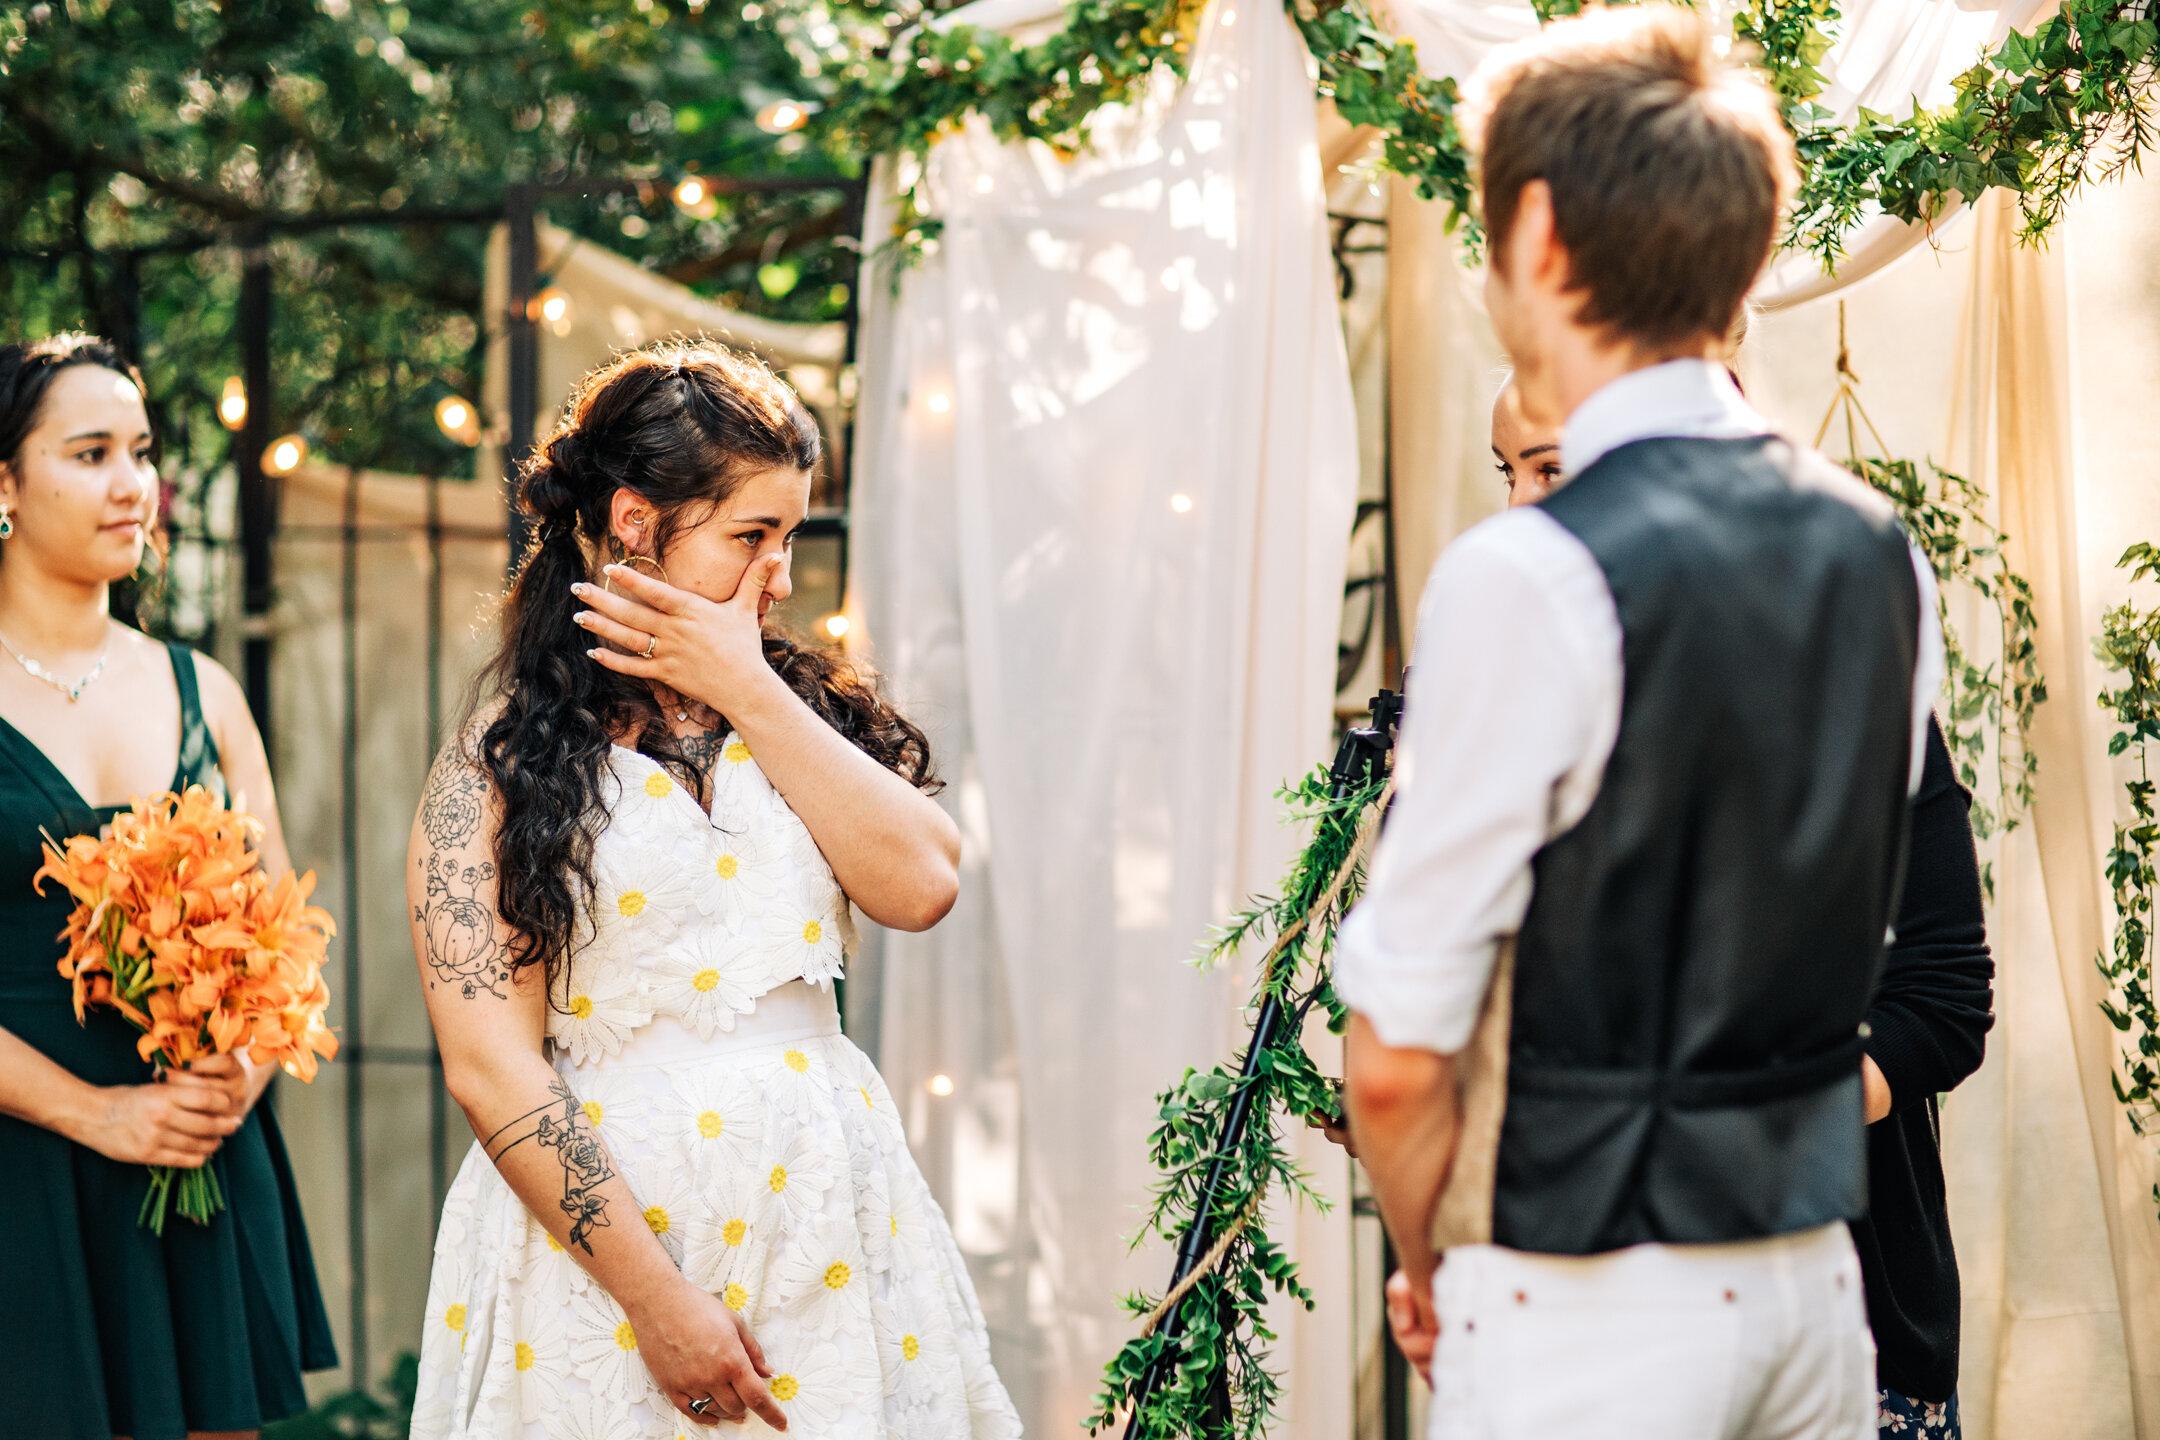 Jake-Amber-Wedding-07144.jpg